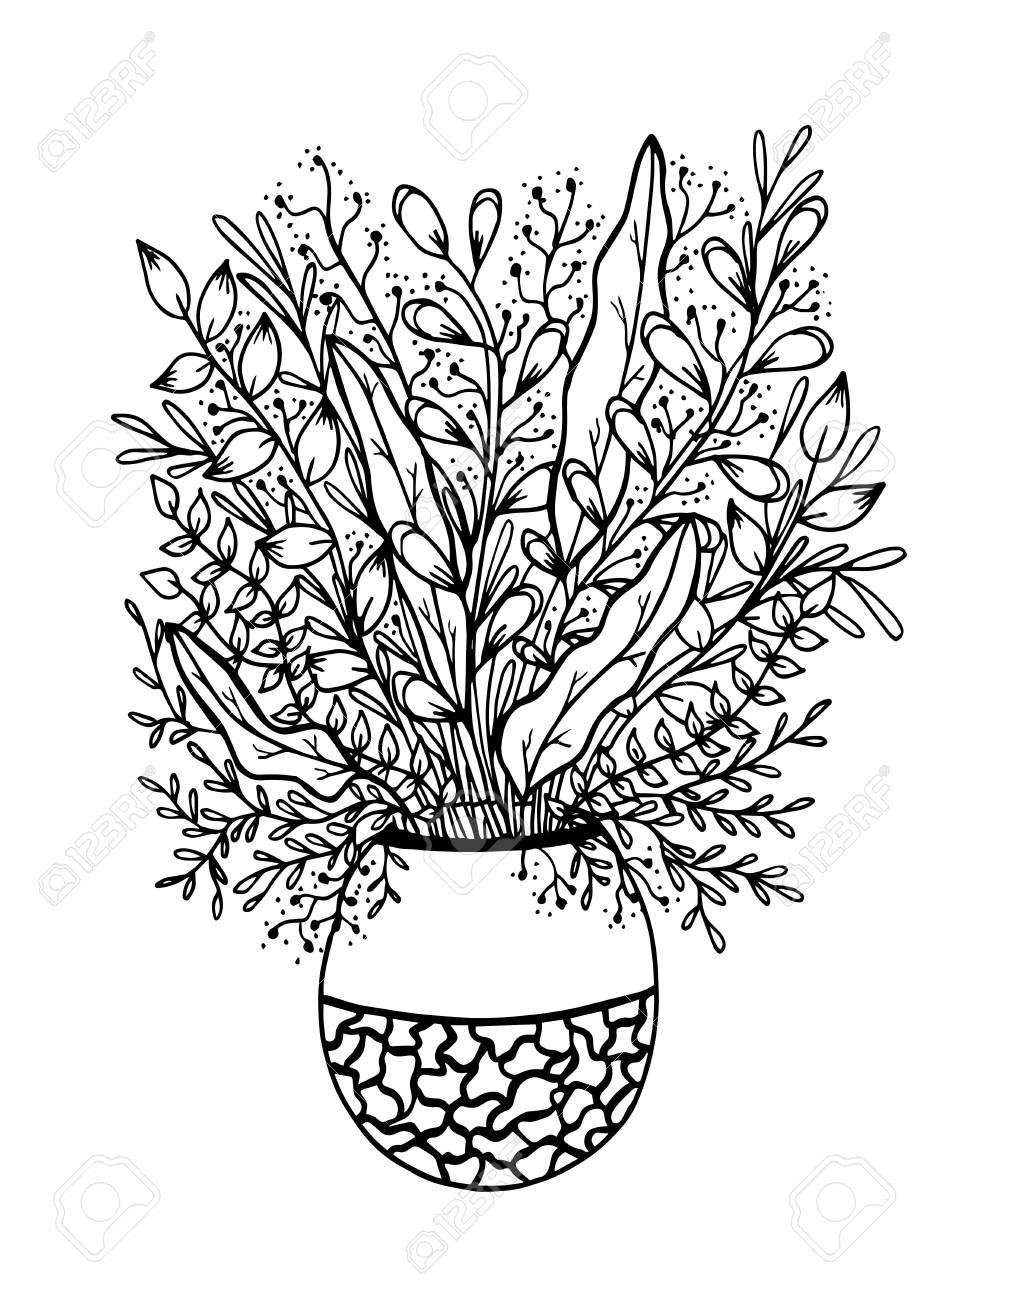 Flower Vase Coloring Page - Flower Vase Icon Png, Transparent Png ... | 1300x1014